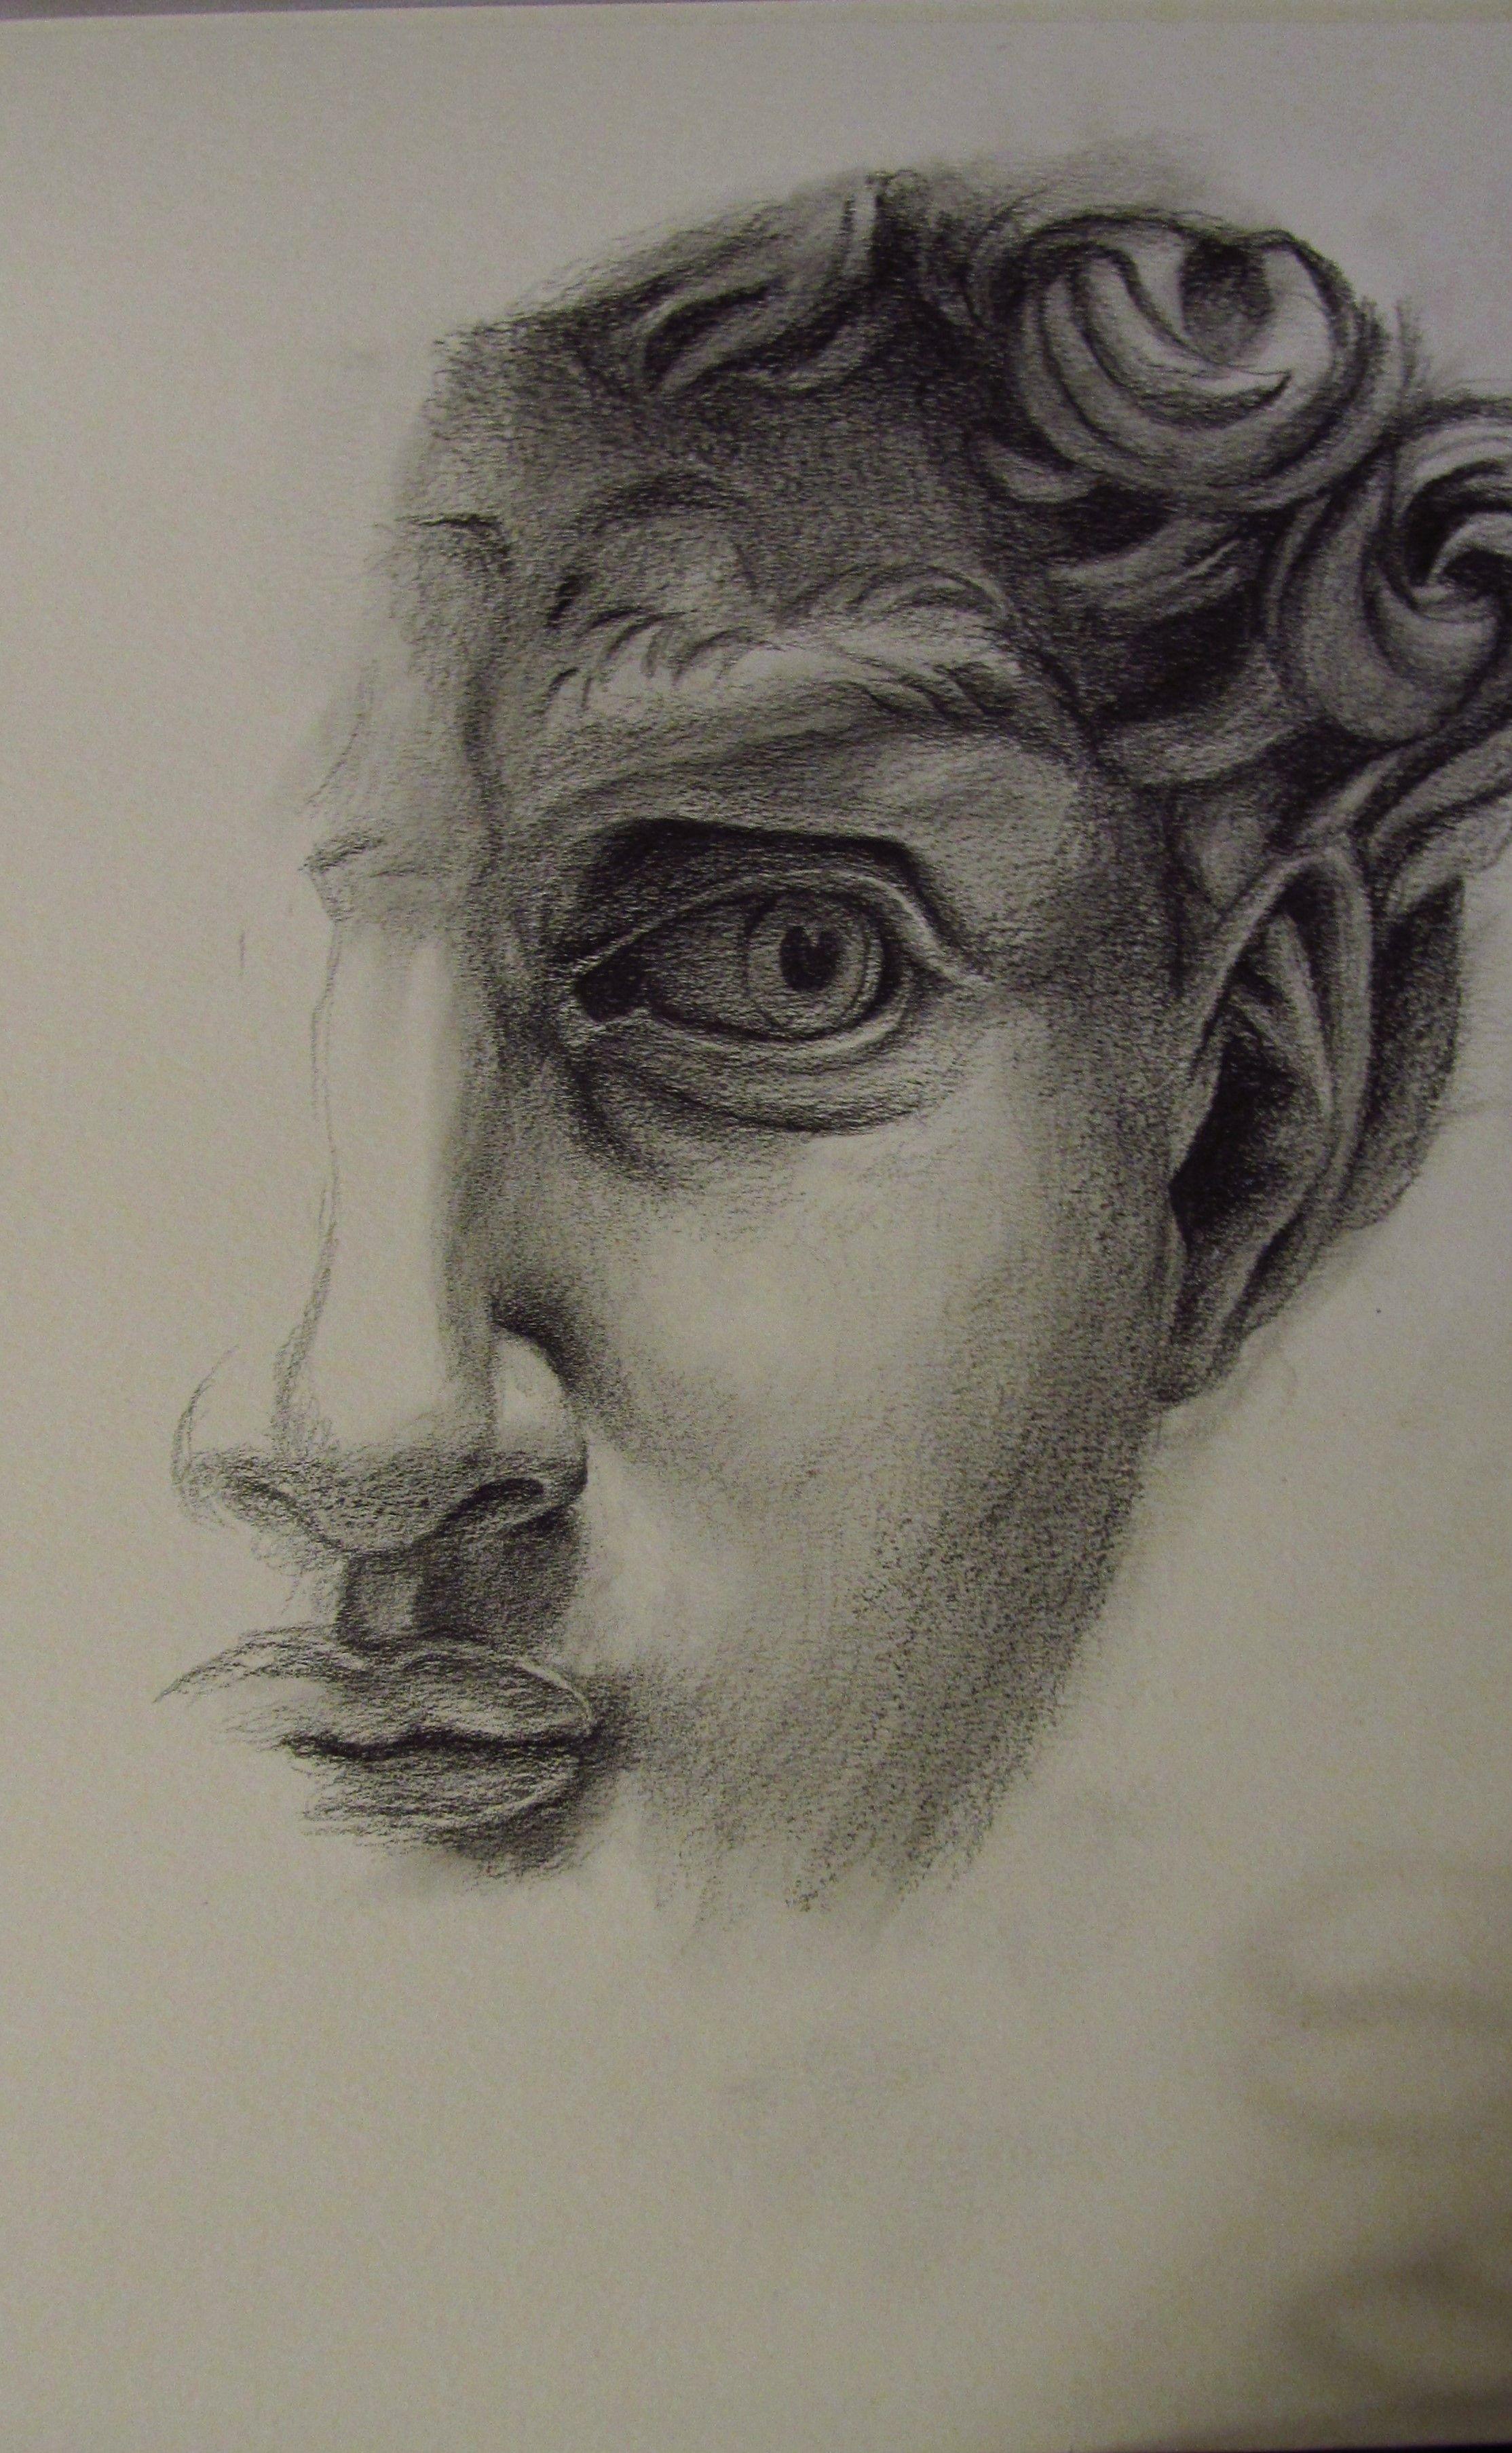 Pin Alina Iftime Drawings And Paintings In 2019 Art Sketchbook Michelangelo